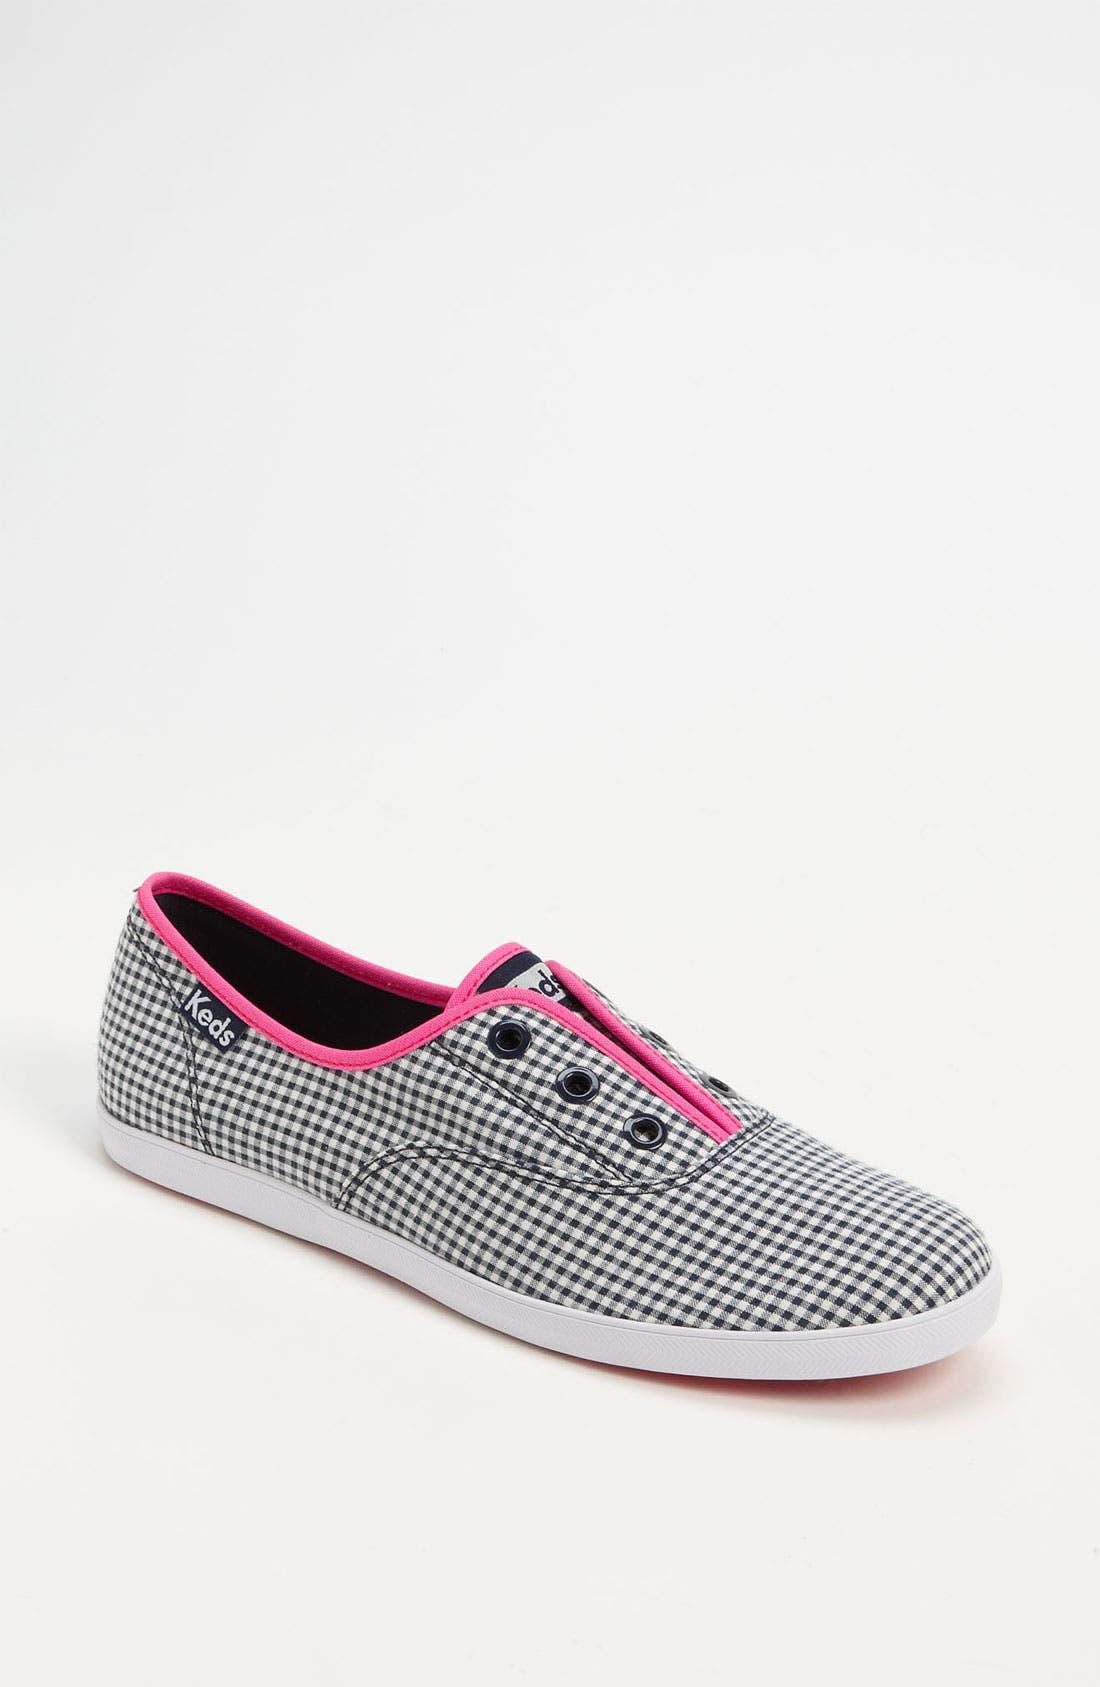 Main Image - Keds® 'Rookie' Sneaker (Women)